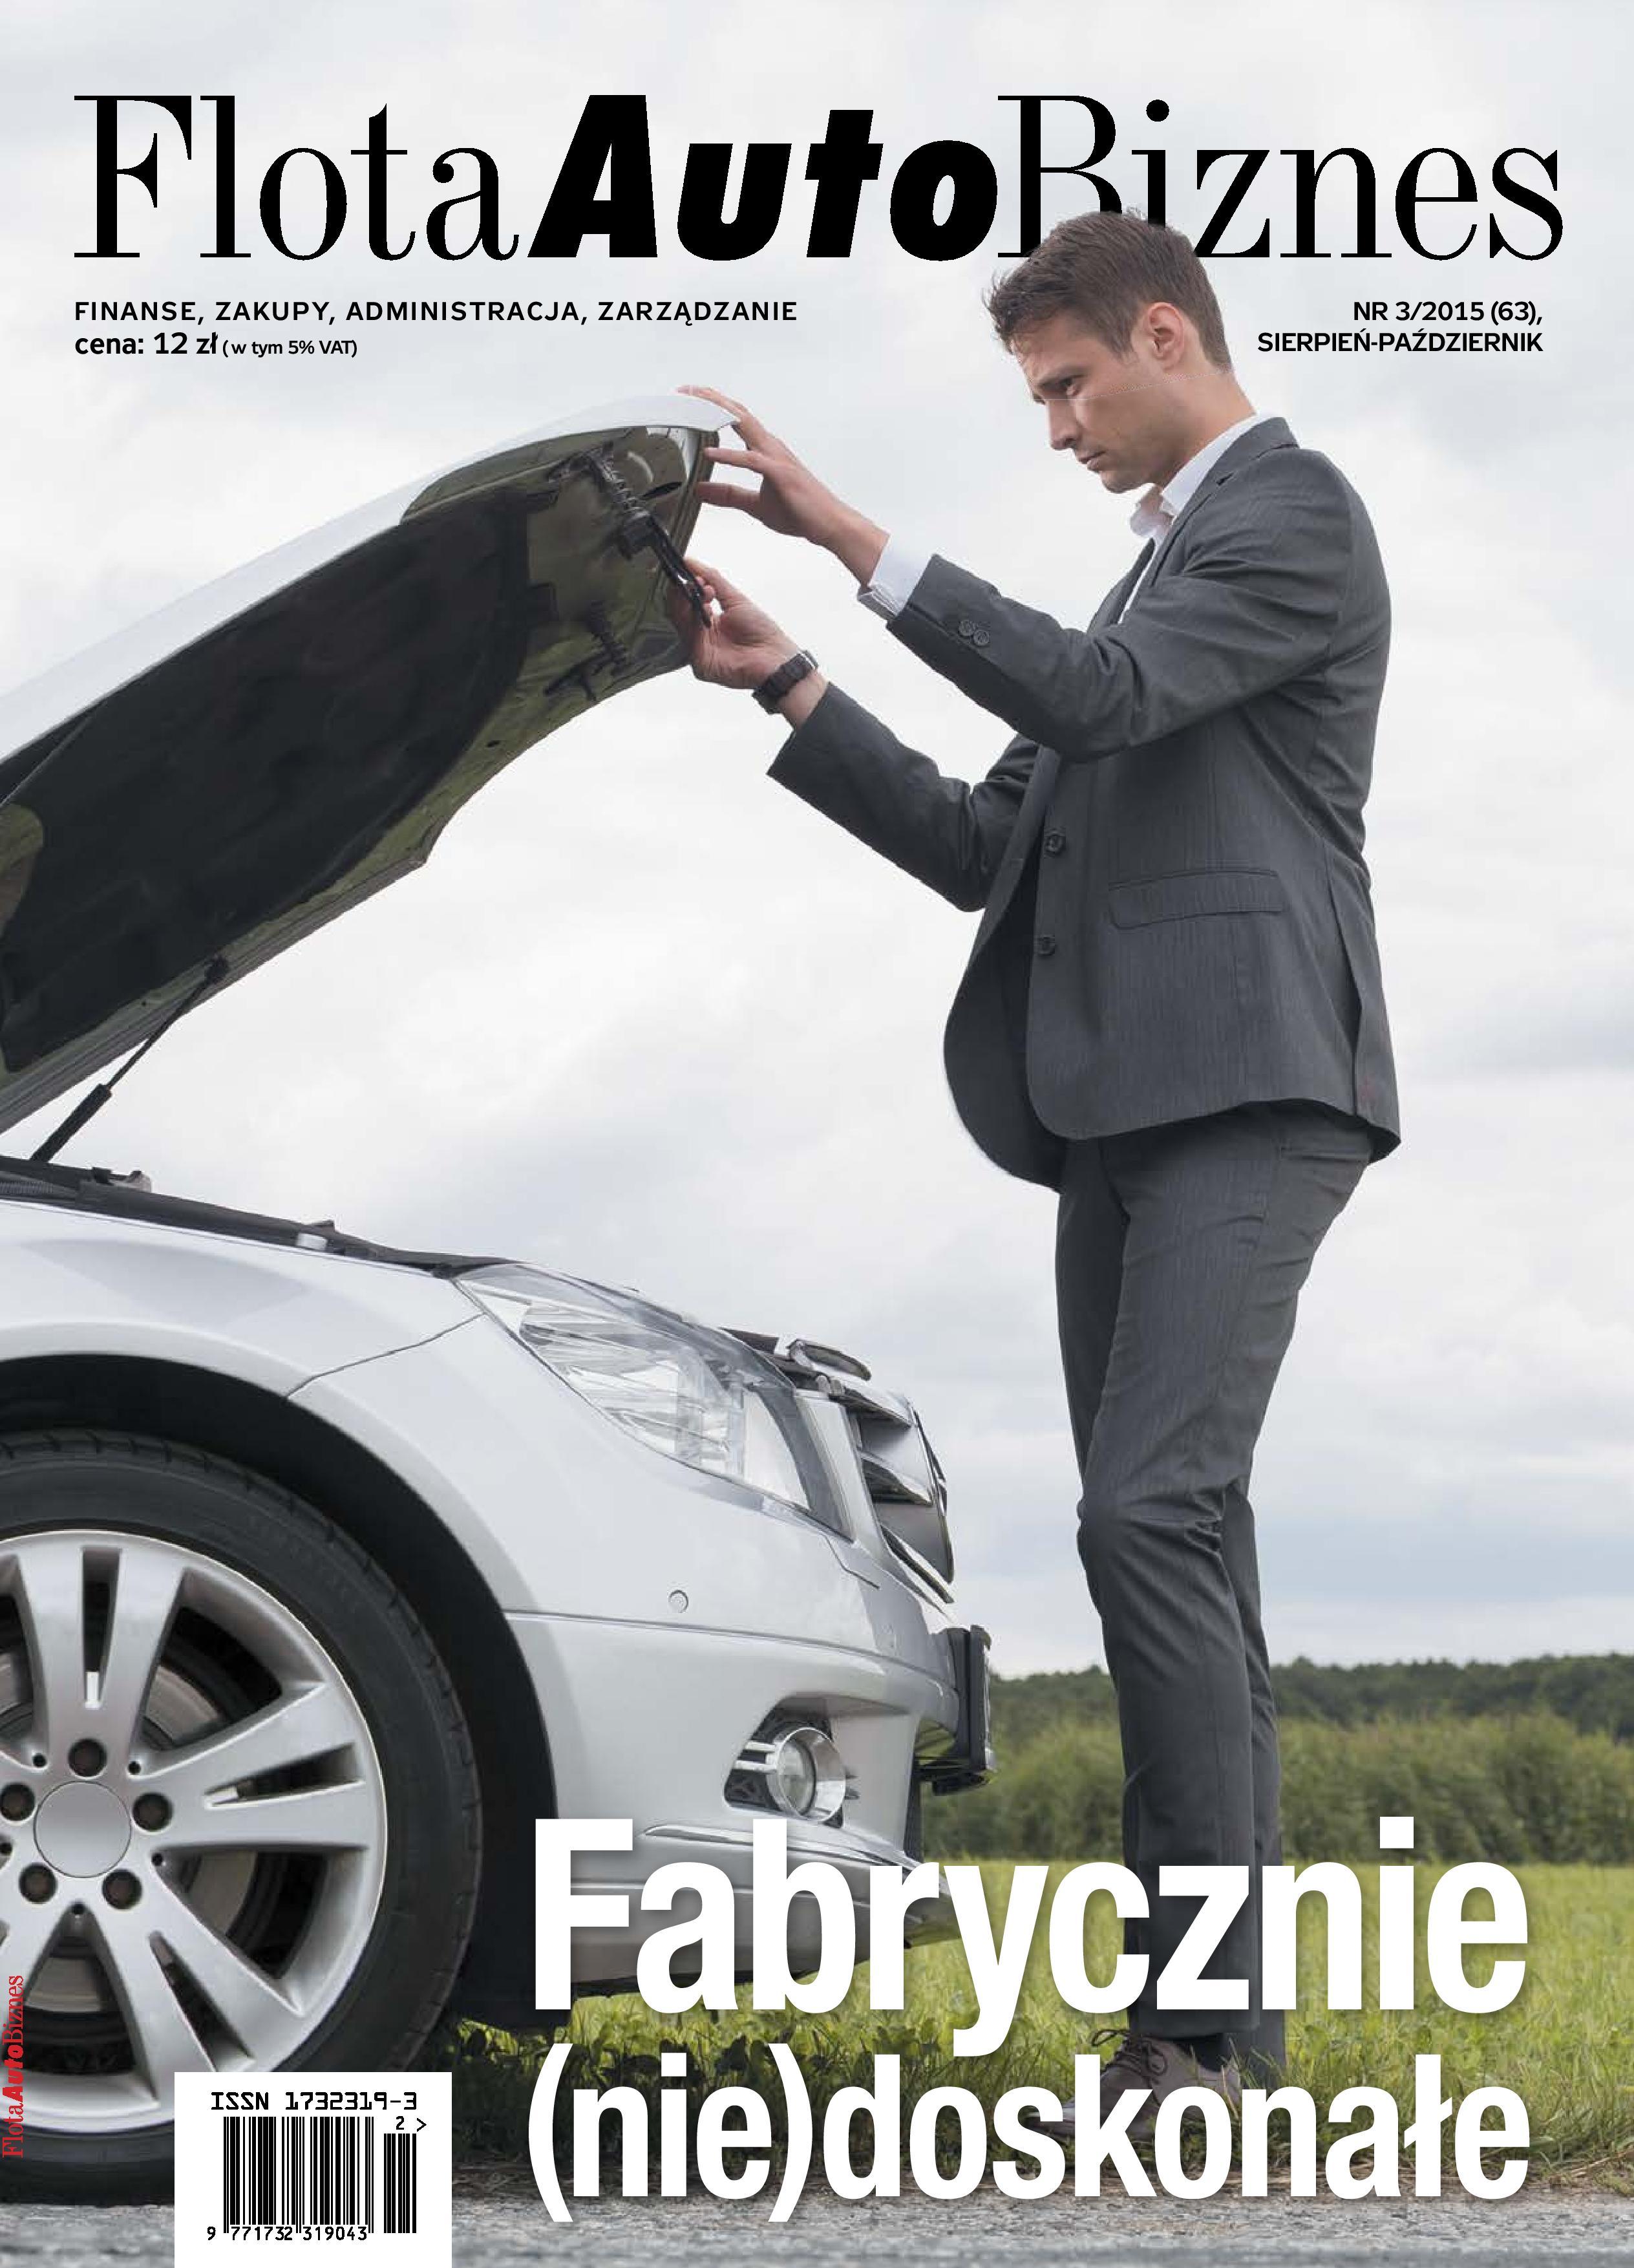 Flota Auto Biznes 3/2015 (63)